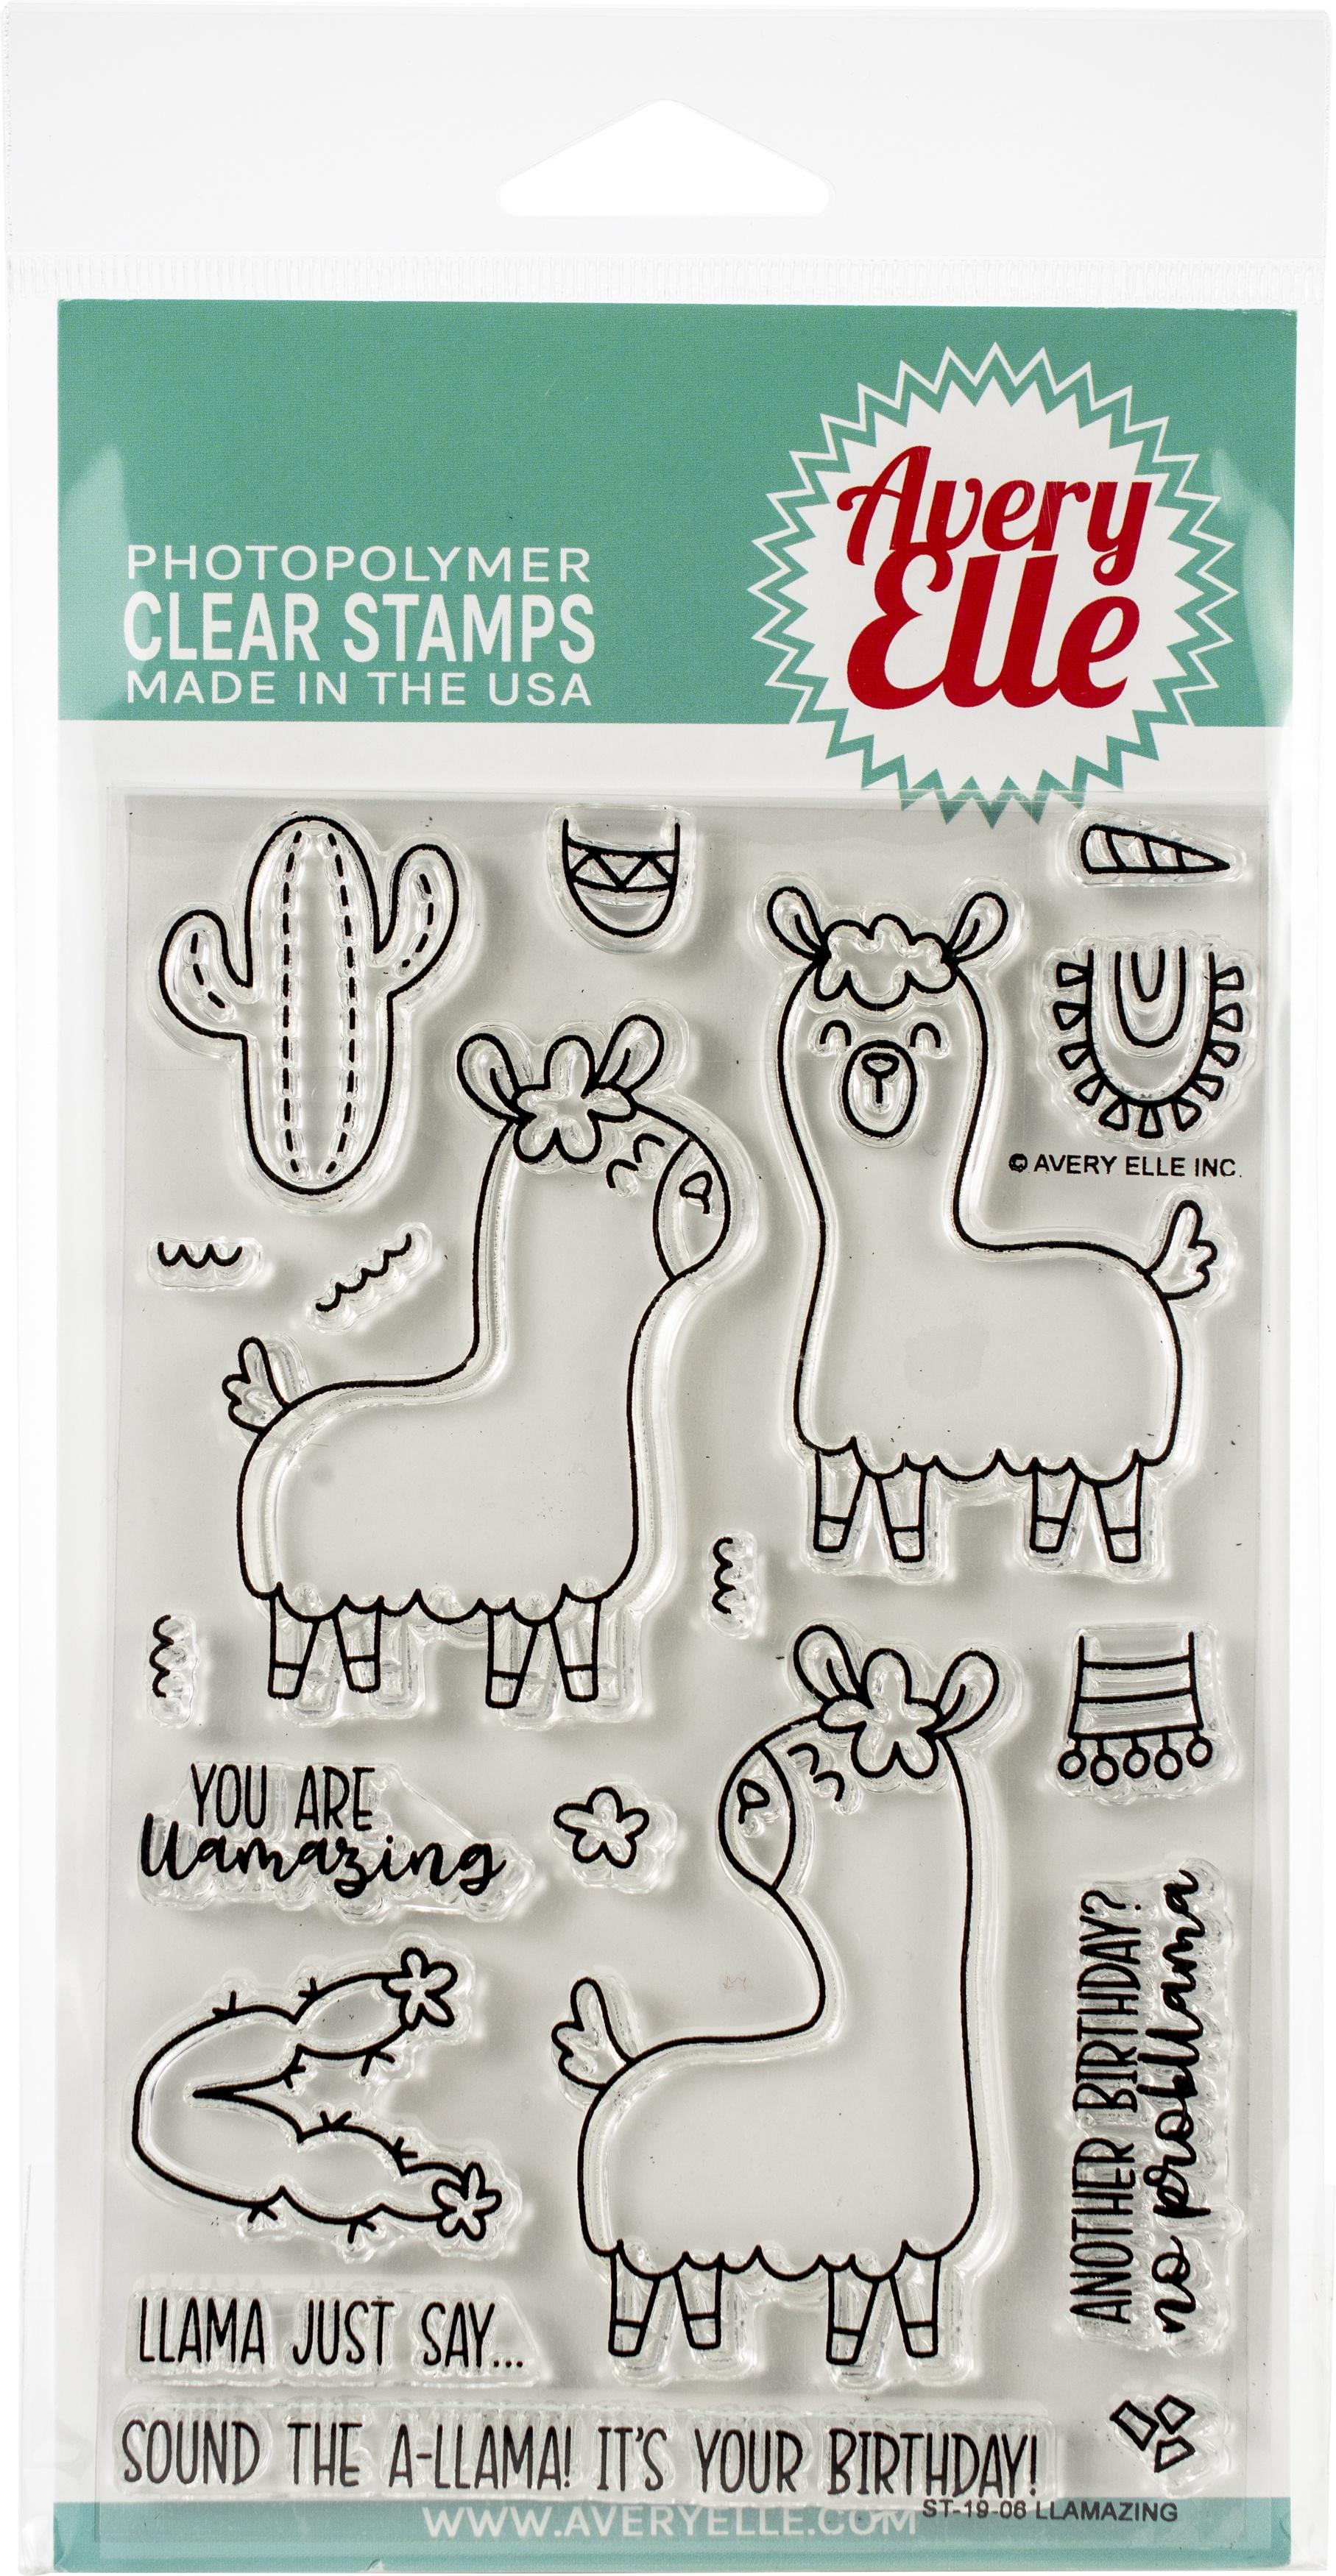 Avery Elle Clear Stamp Set 4X6-Llamazing